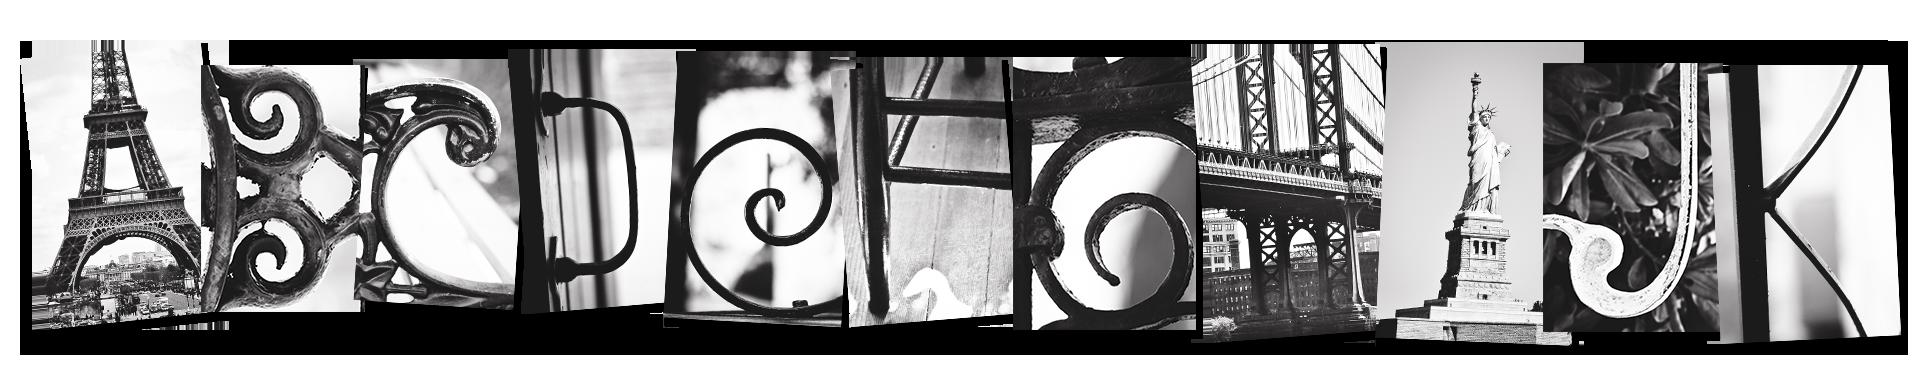 Alphabet art photography clipart